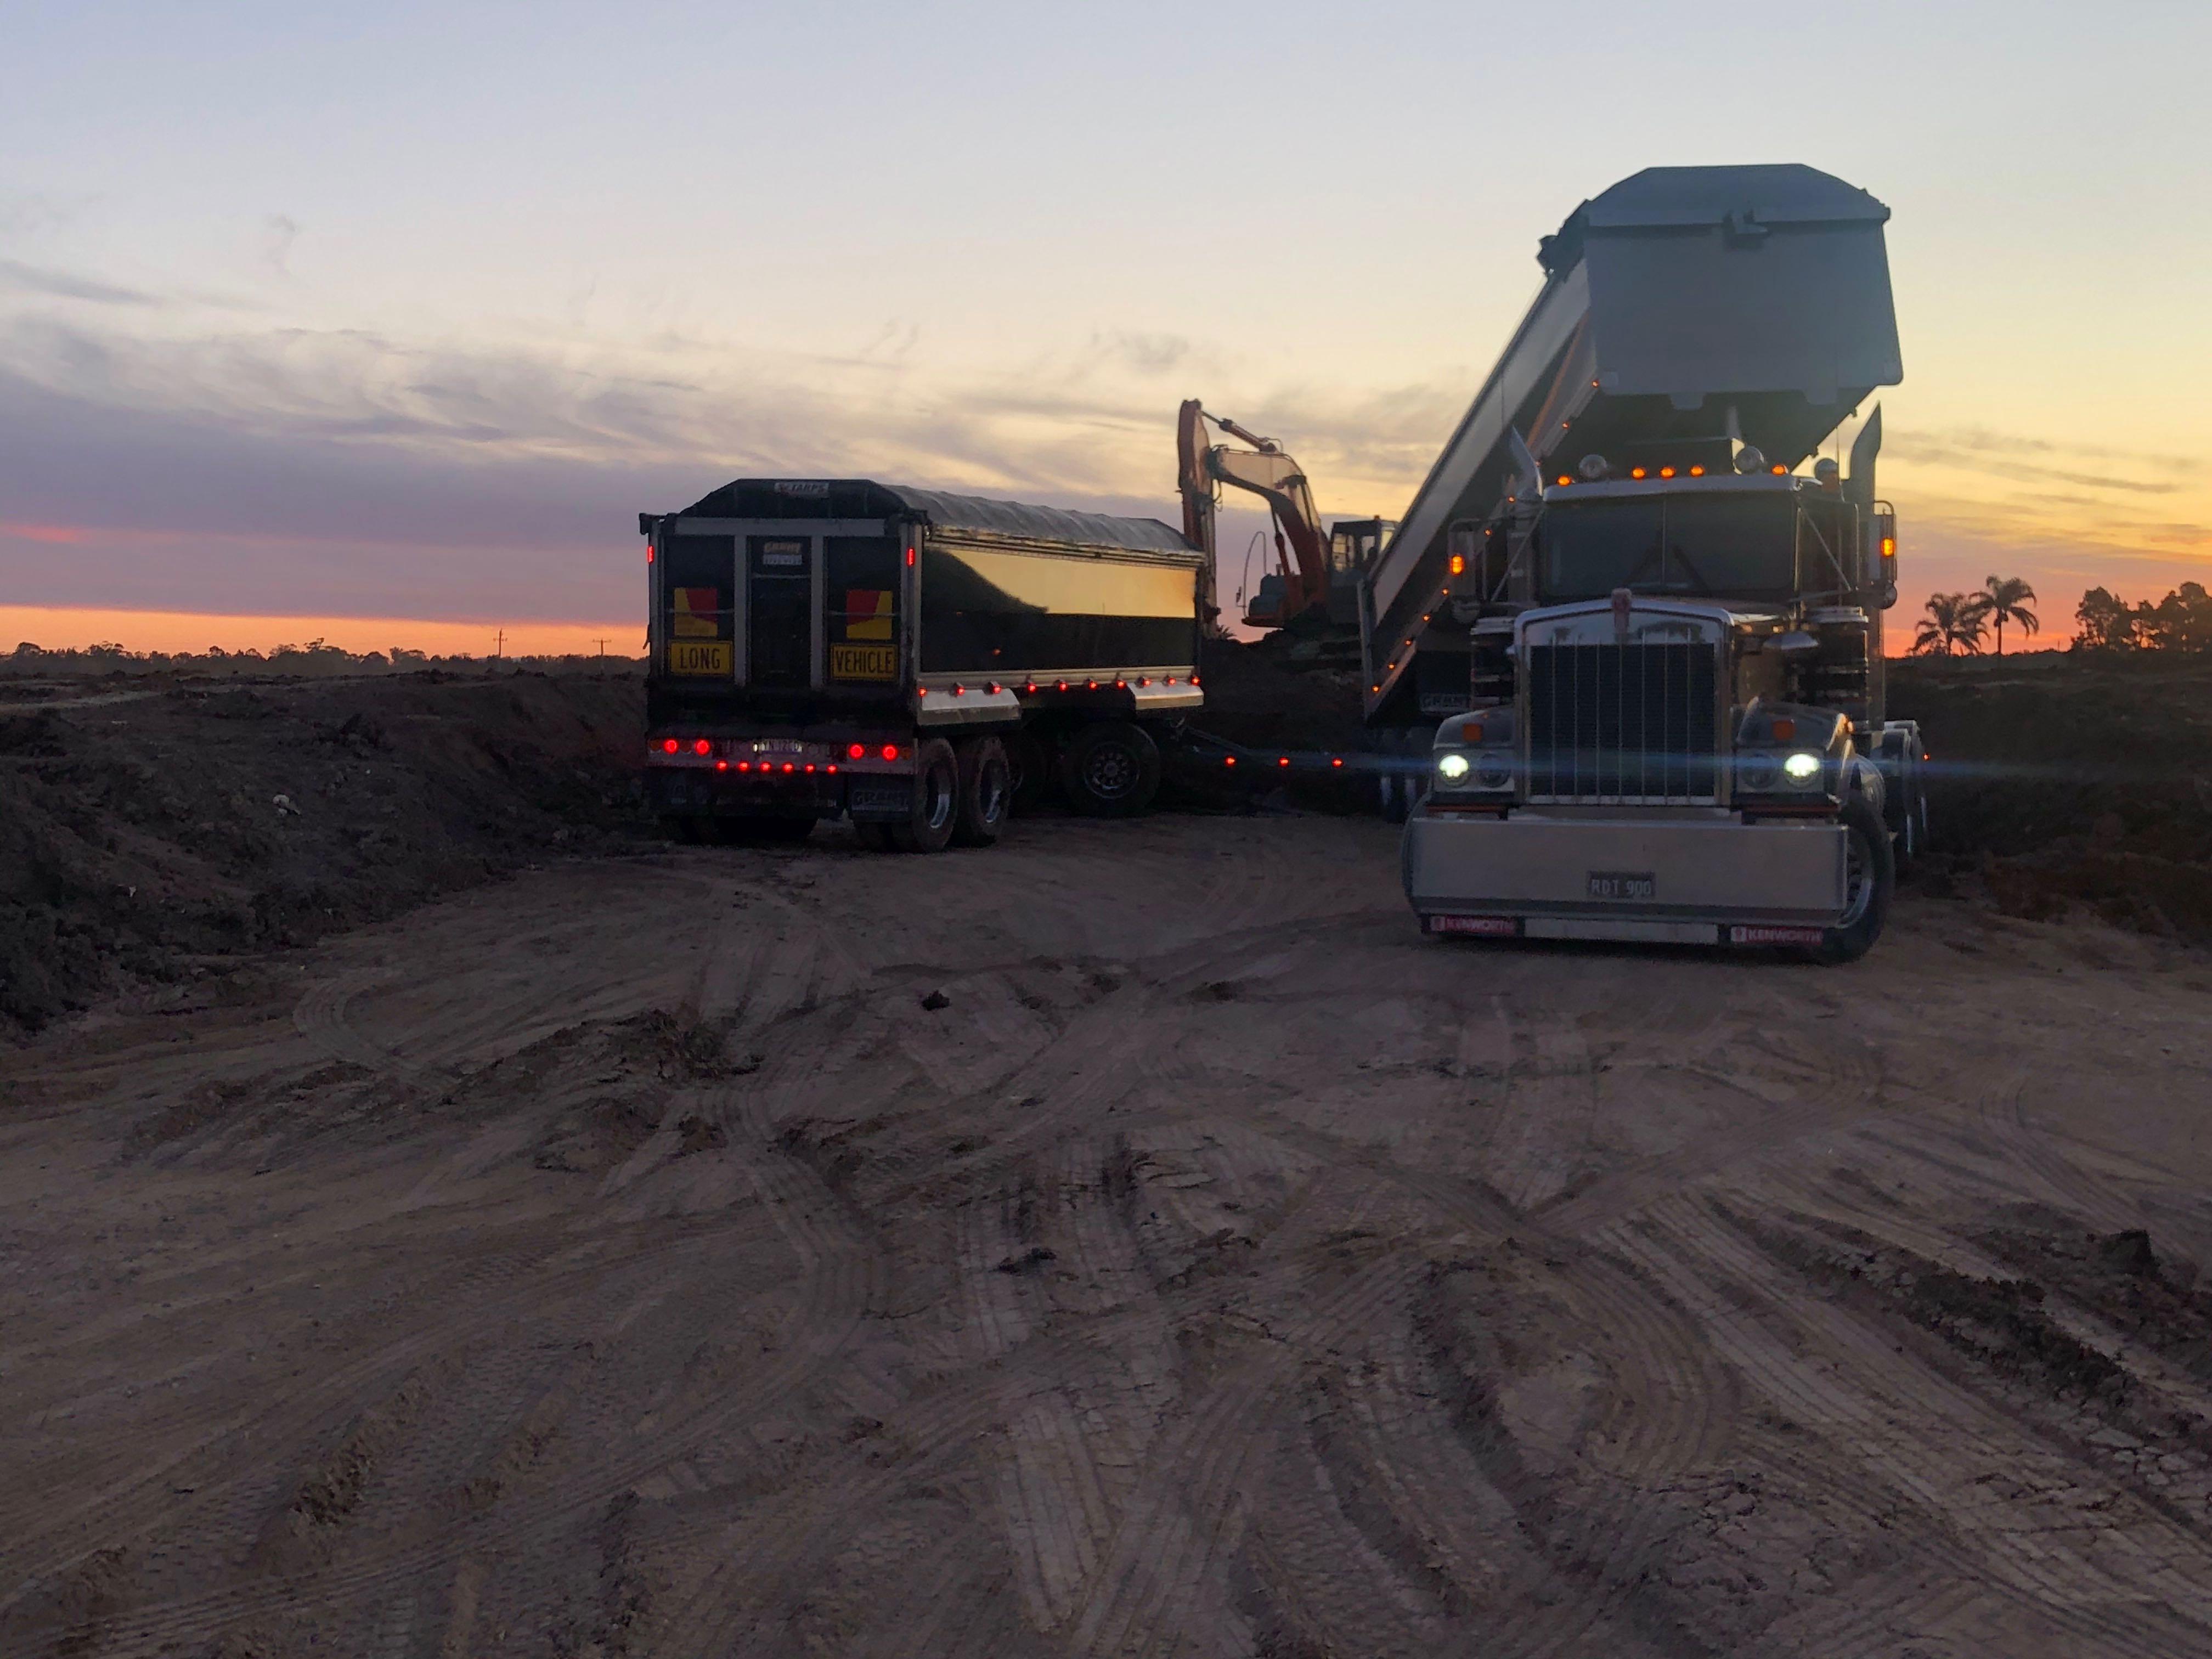 Hire Bulk haulage & quarry products